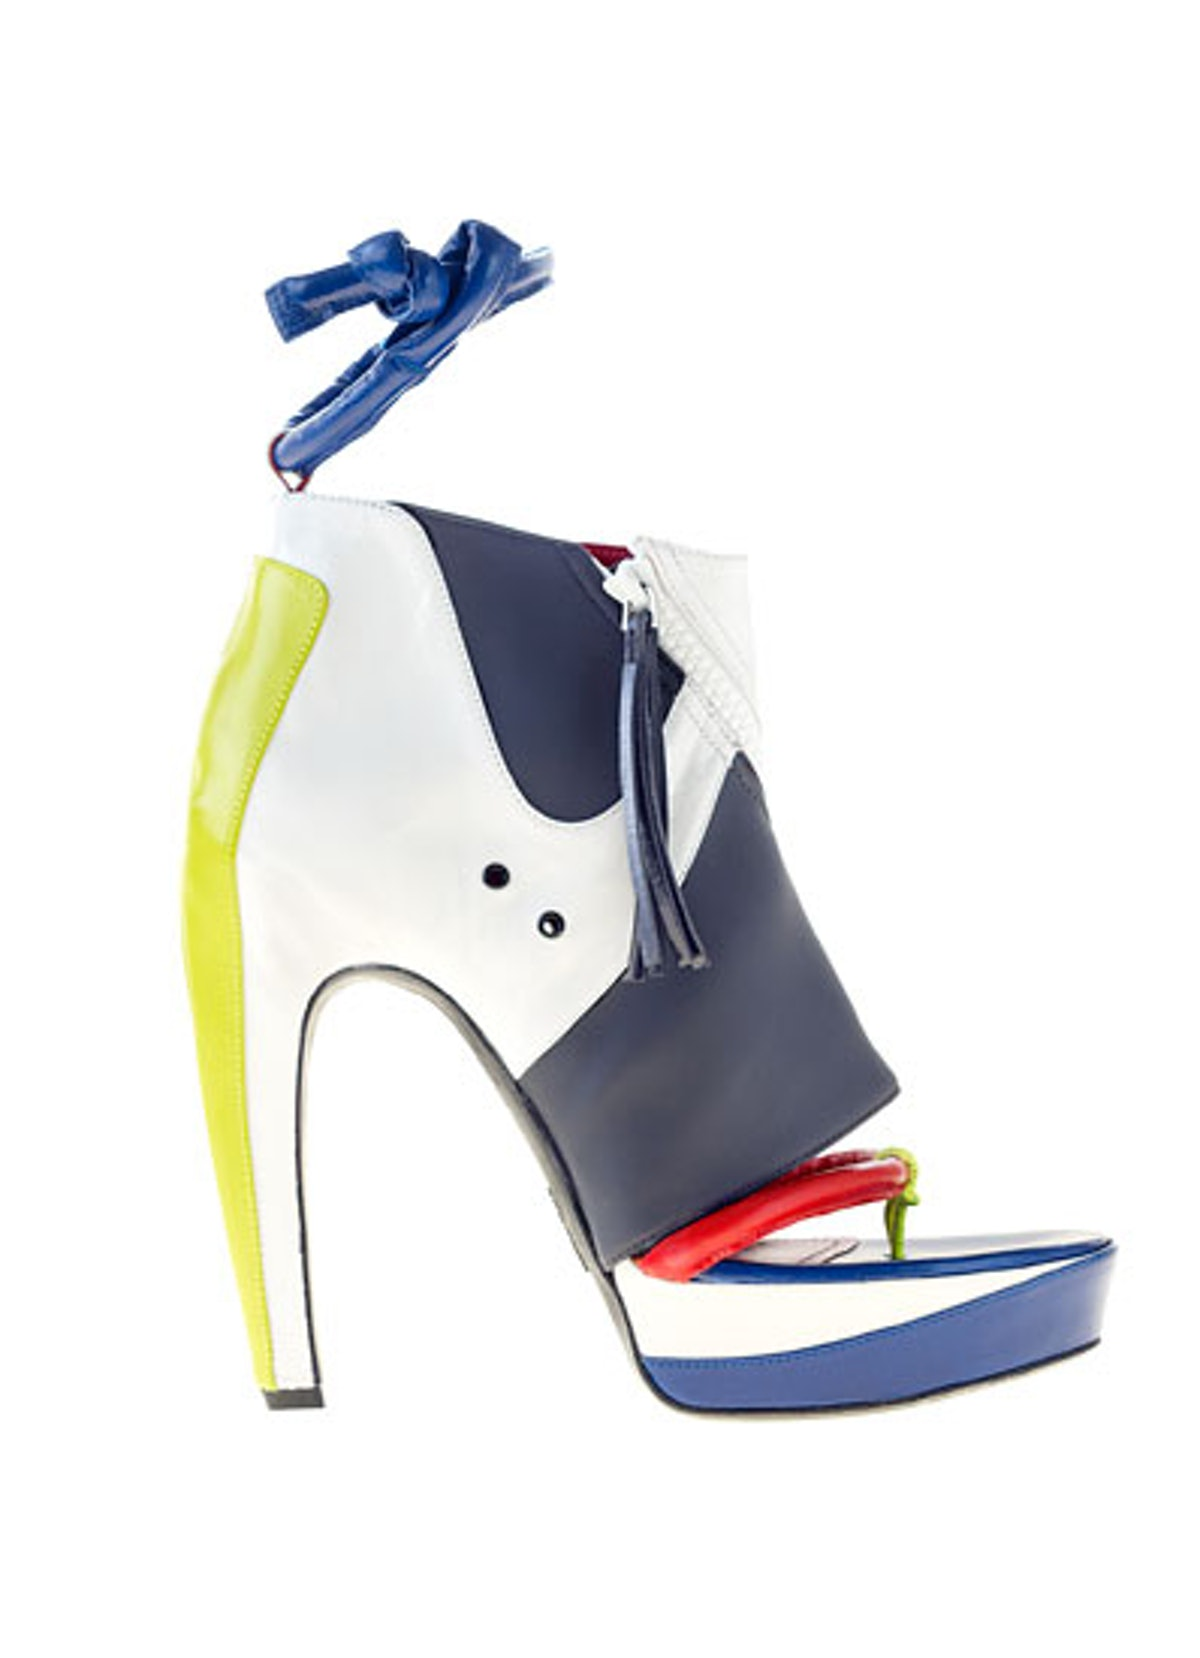 acss_shoes_02_v.jpg